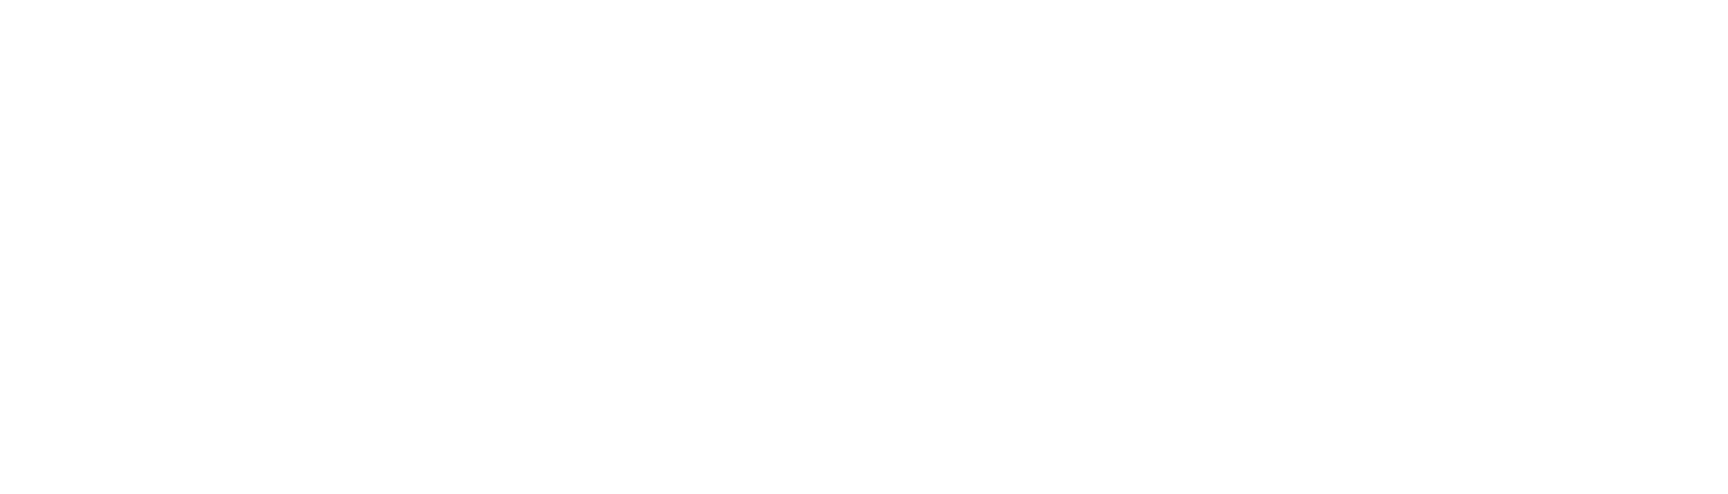 Merrill A Bank of America company logo